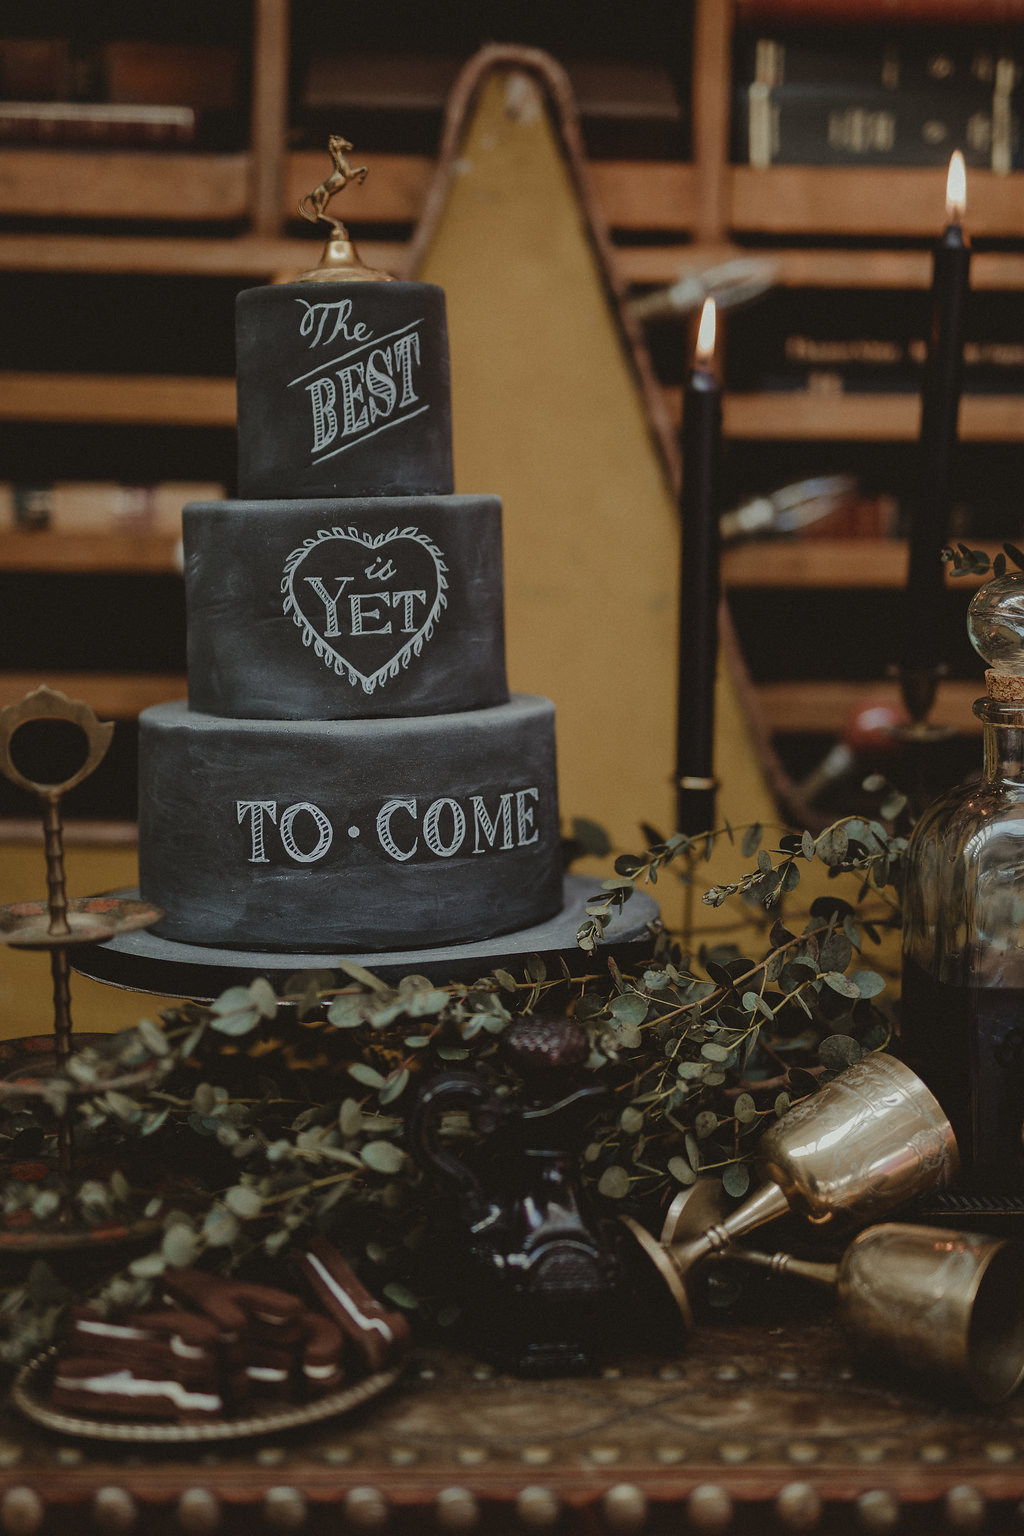 Studio Fotografico Bacci - Steampunk wedding - alternative wedding 29